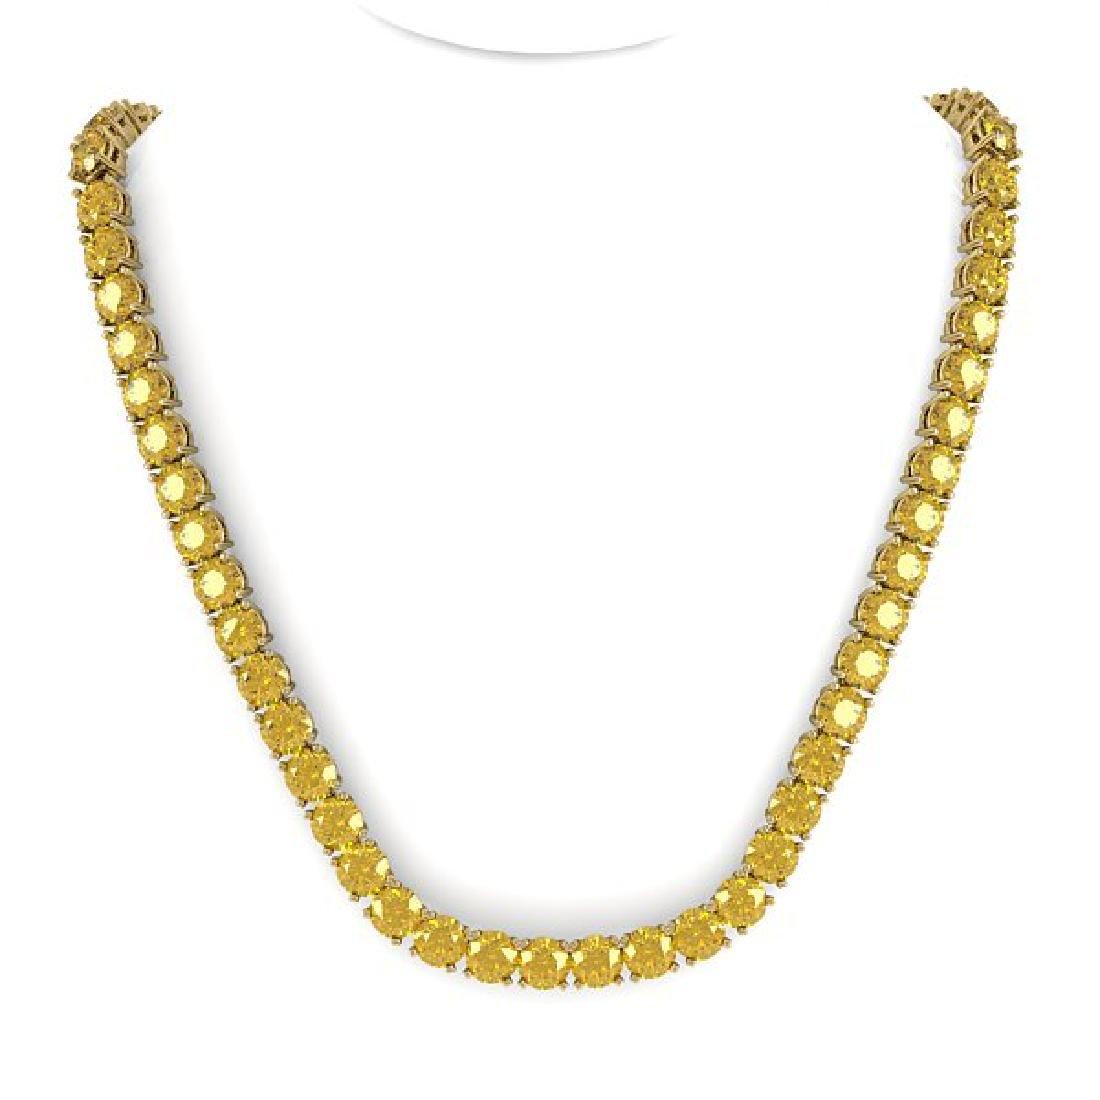 36 CTW Certified Fancy Yellow SI Diamond Necklace 14K - 2